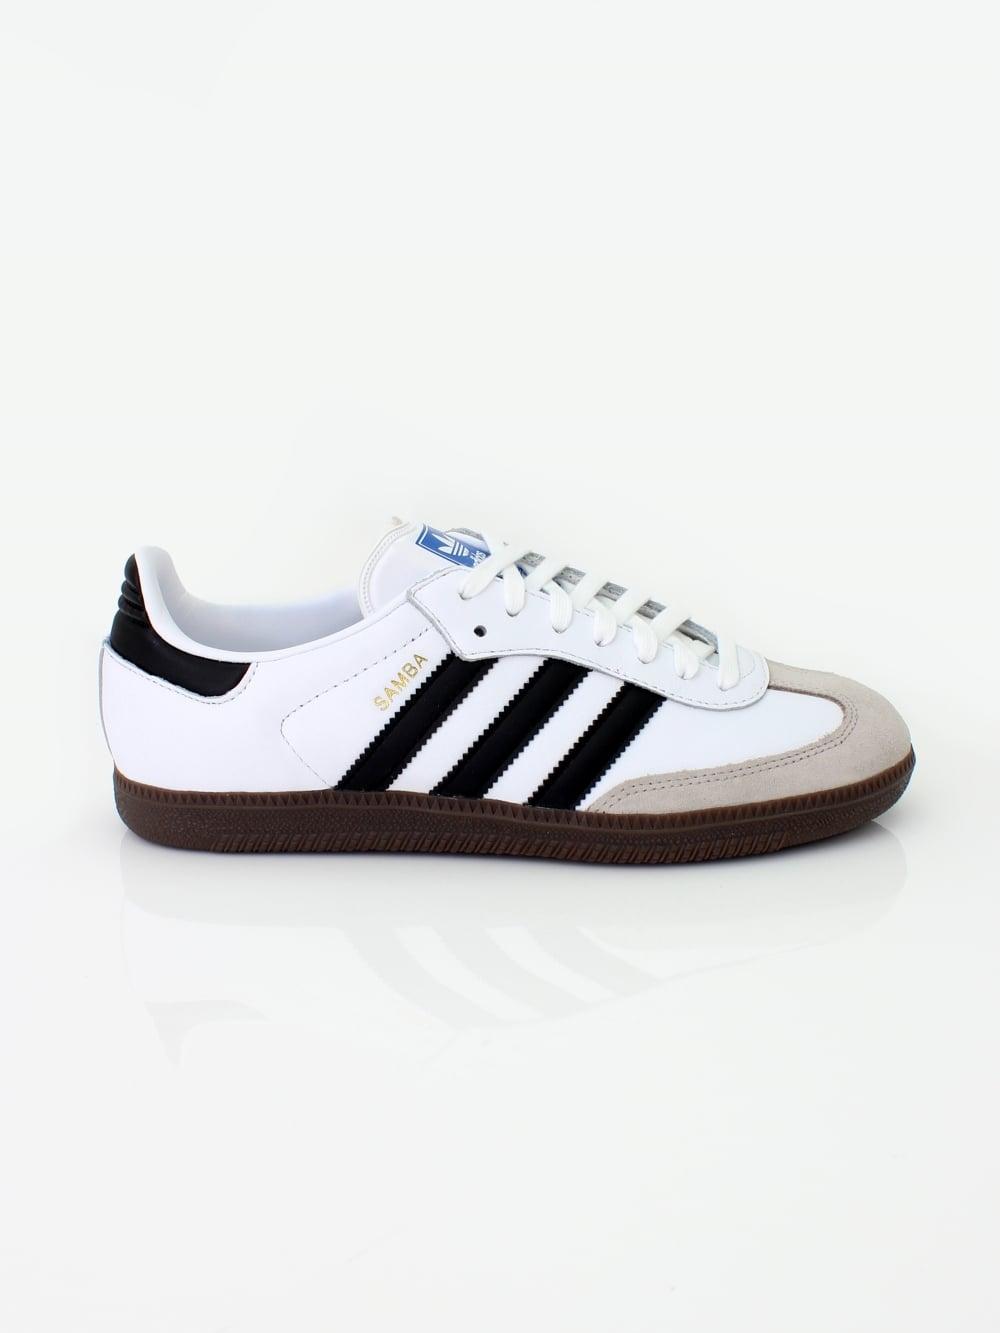 adidas Originals Samba OG Trainers in White Granite - Northern Threads 8699e13f1